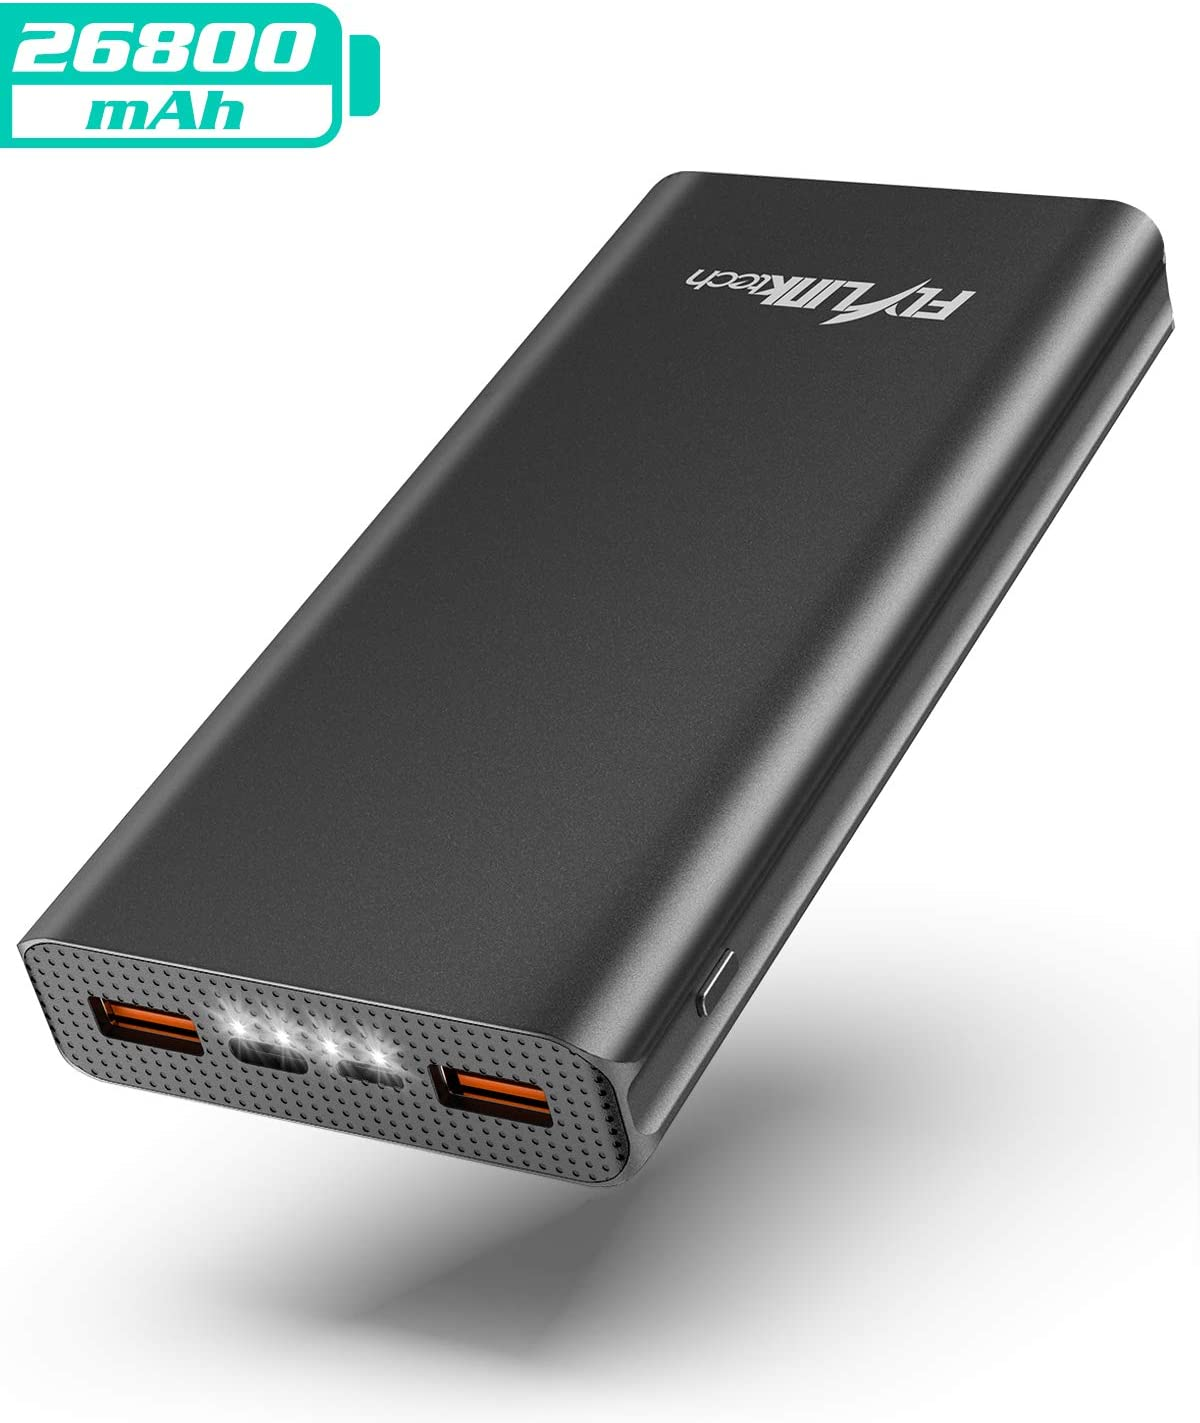 FLYLINKTECH Batería Externa 26800mAh QC 3.0 Power Bank Cargador Móvil Portátil con USB-C PD, Cargador Portátil de Alta Capacidad de Carga Rápida para iPhone/iPad/MacBook/Samsung Galaxy/Huawei -Negro